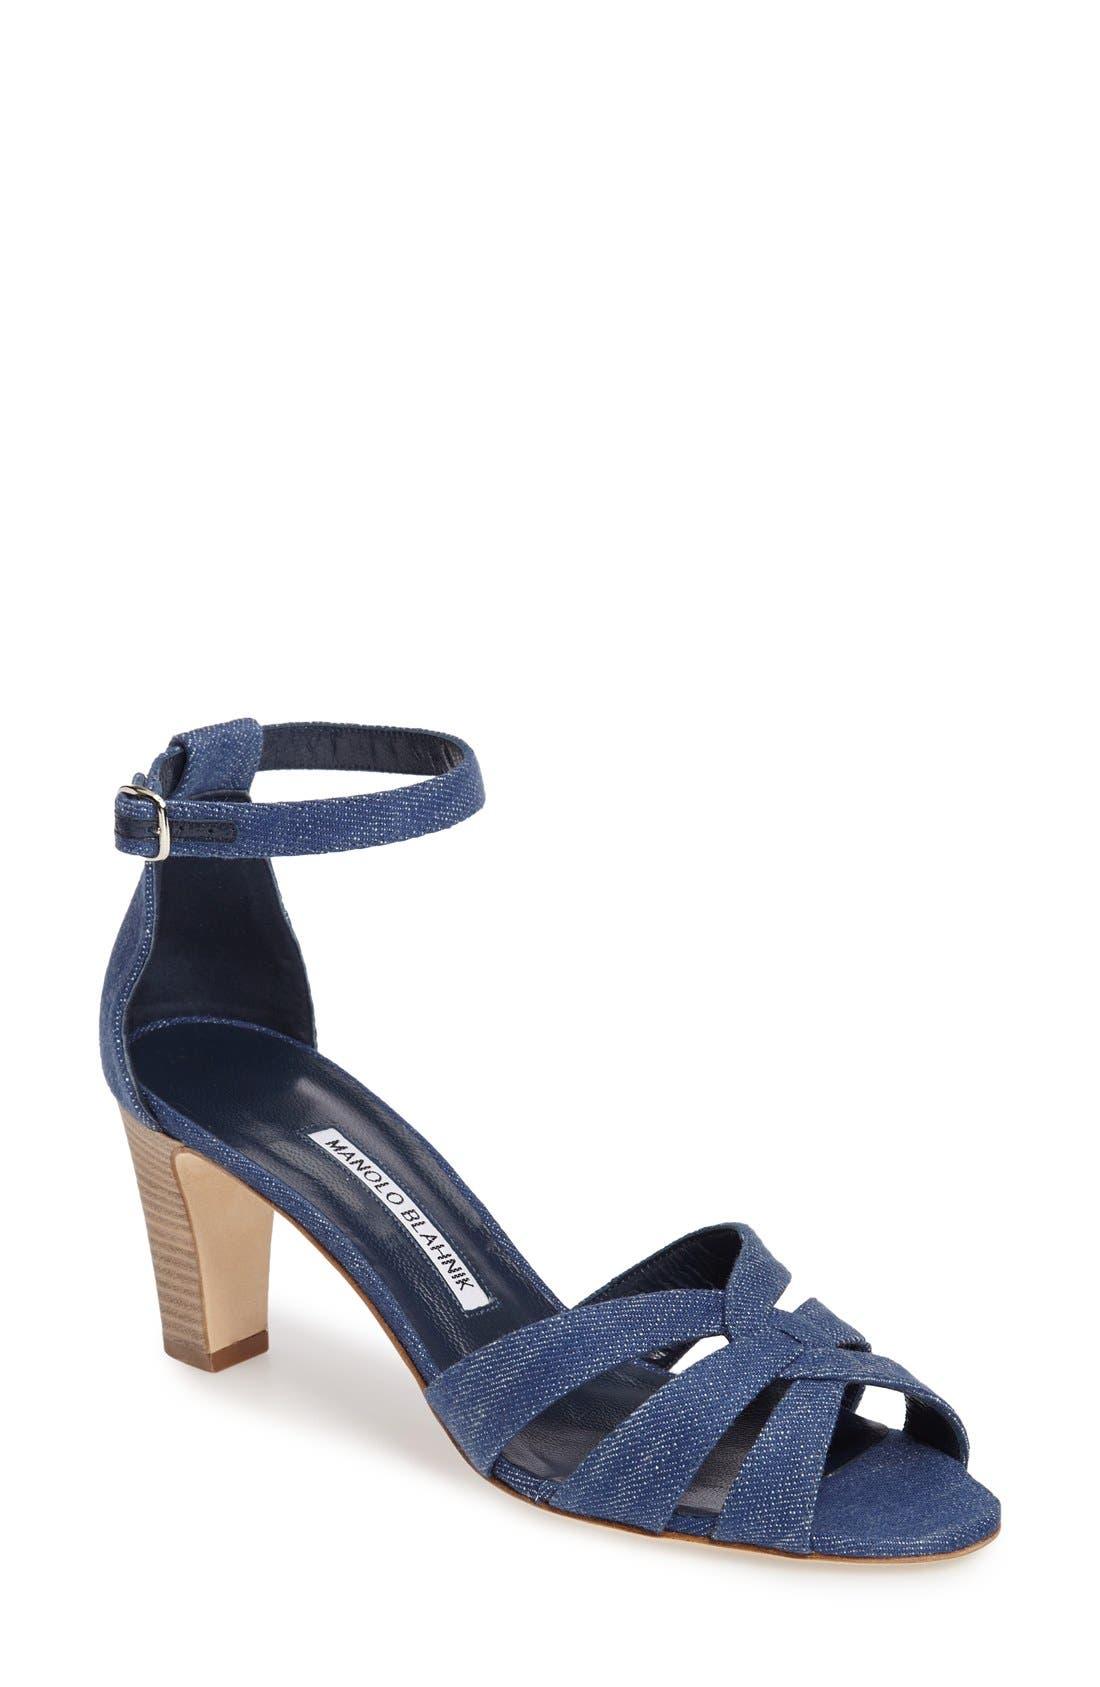 Alternate Image 1 Selected - Manolo Blahnik Unista Sandal (Women)